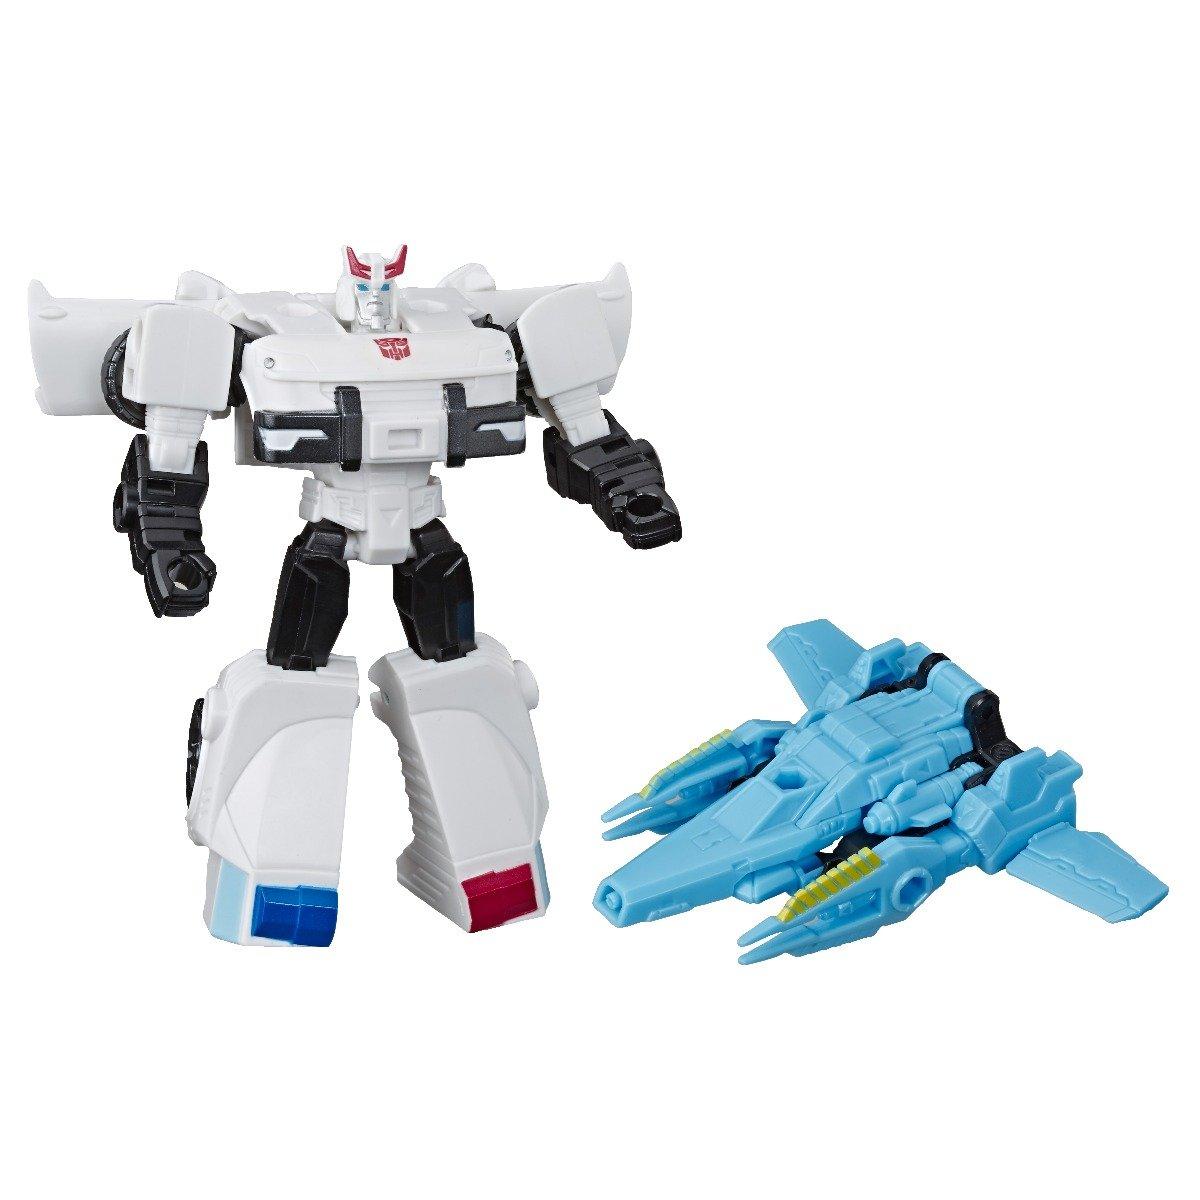 Figurina Transformers Cyberverse, Prown Cosmic Patrol, E4295